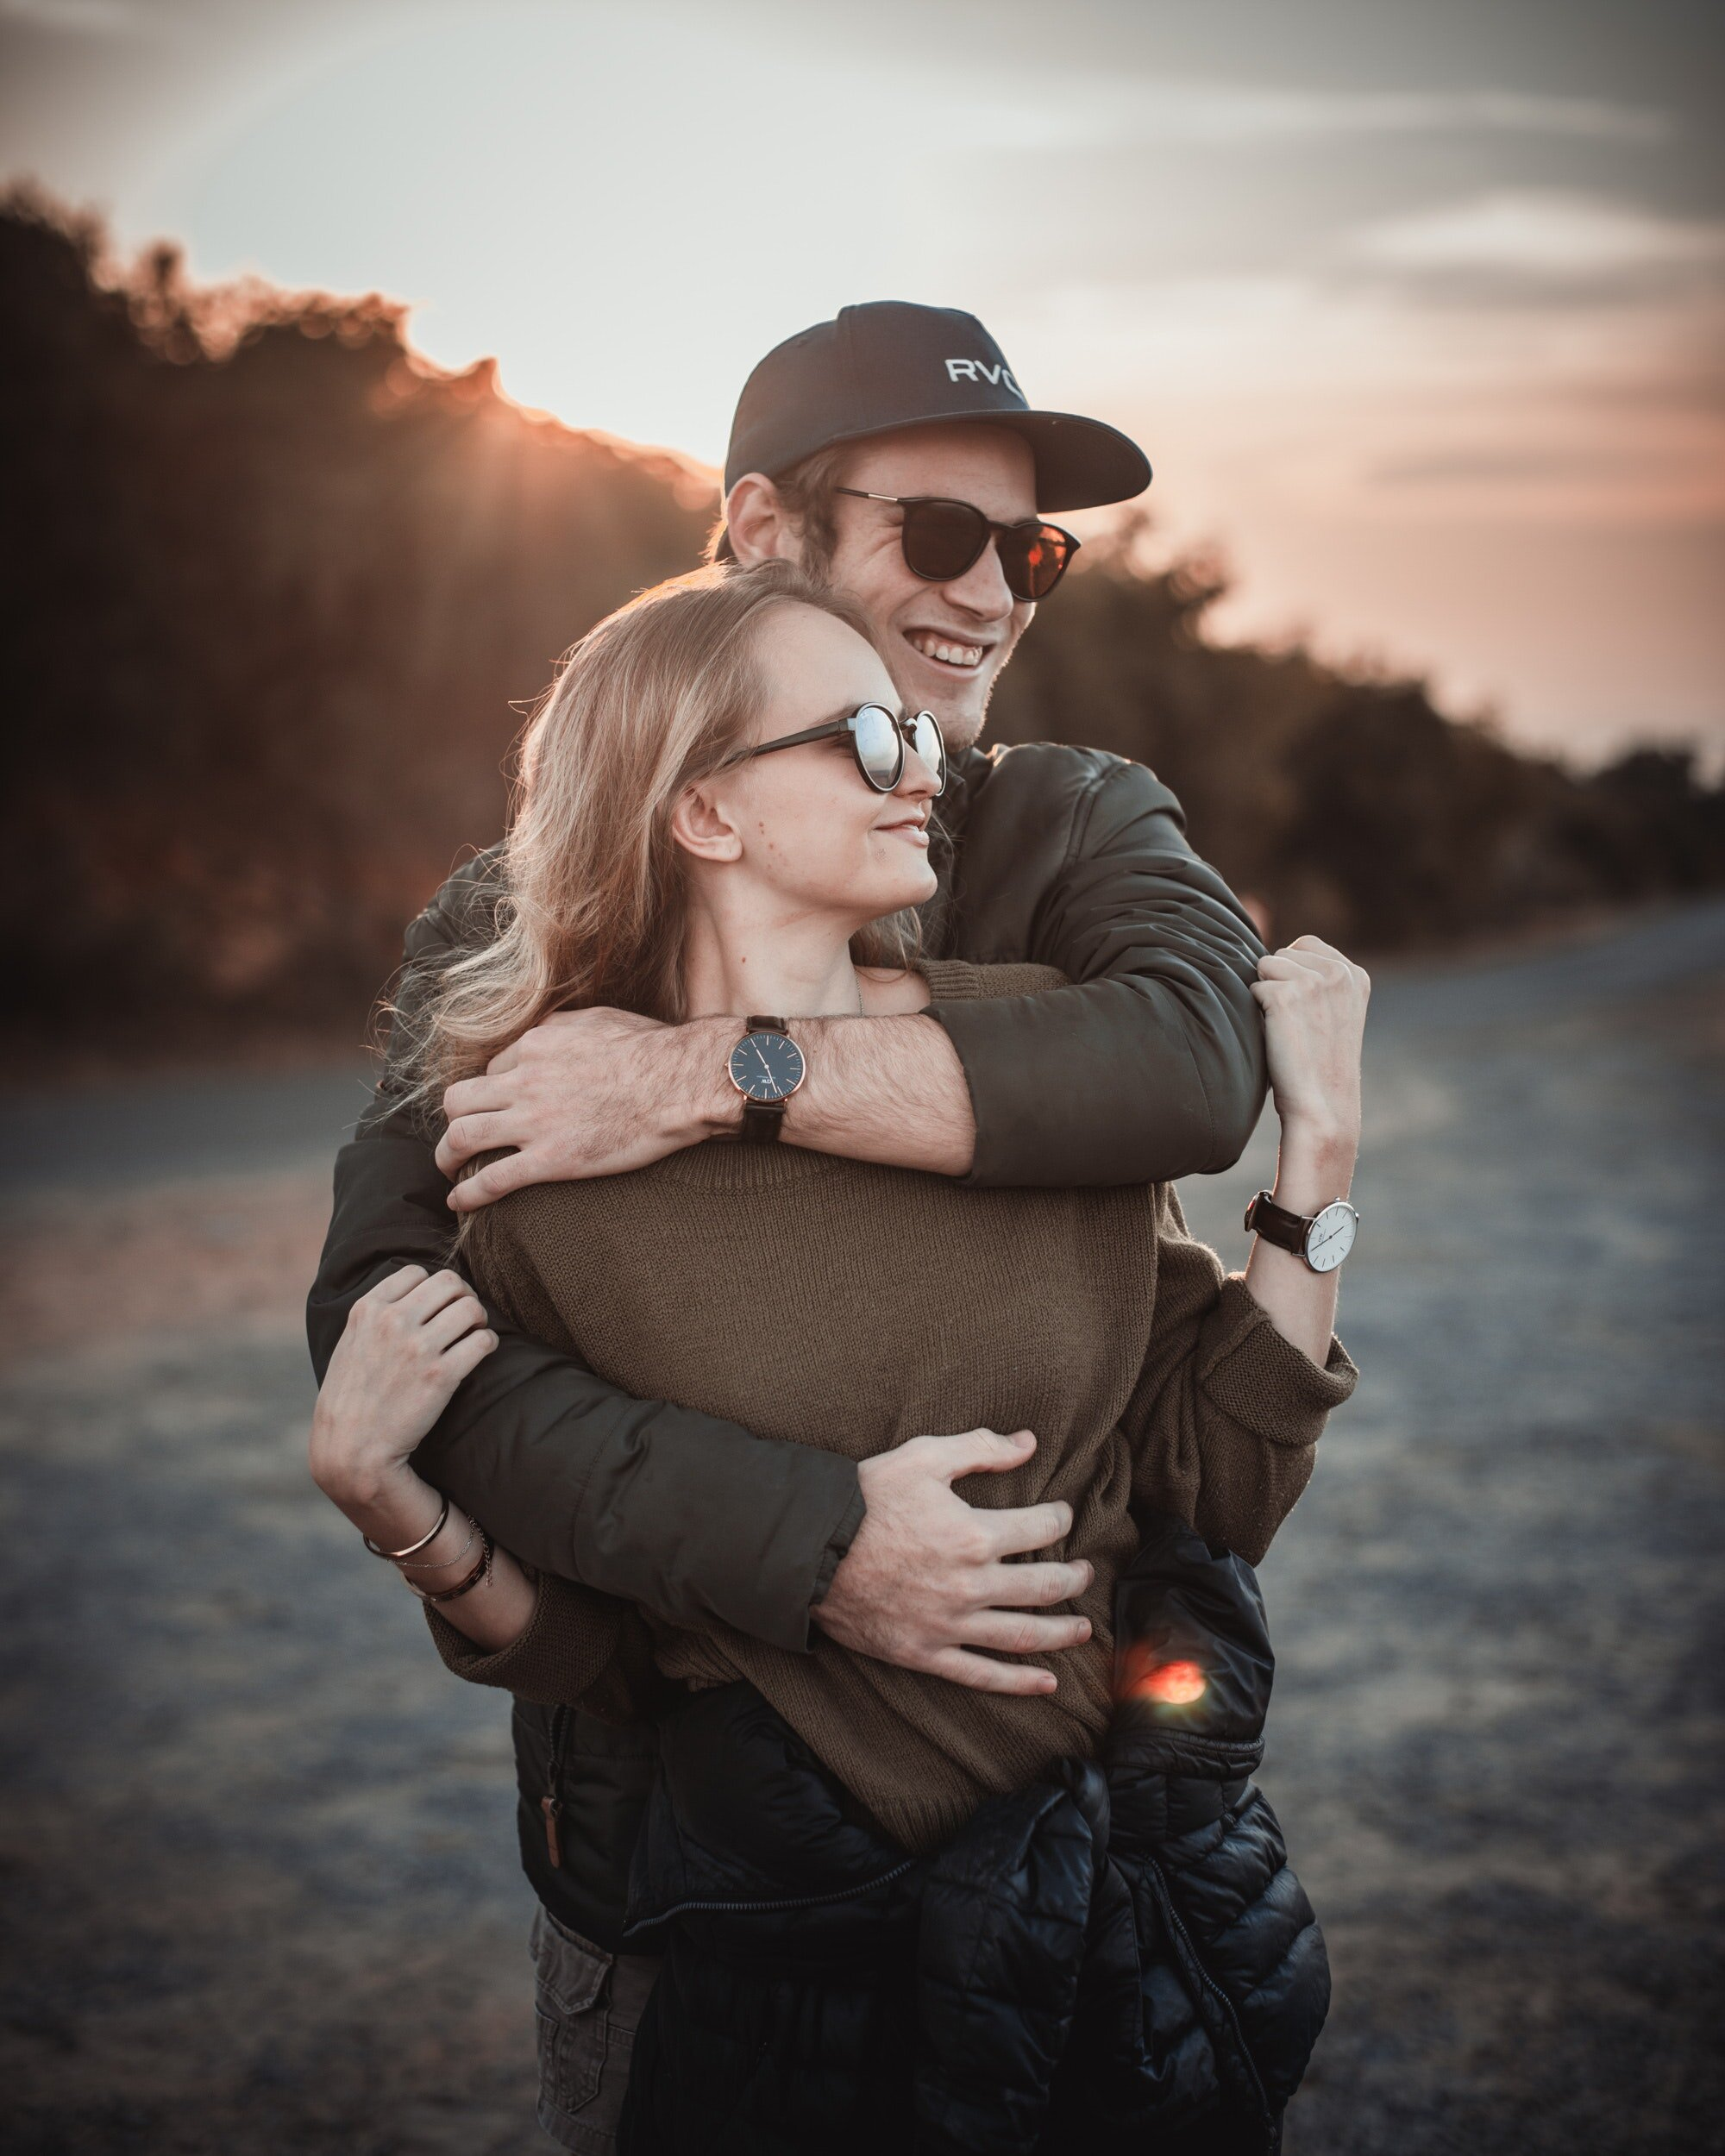 affection-blur-couple-2590706.jpg